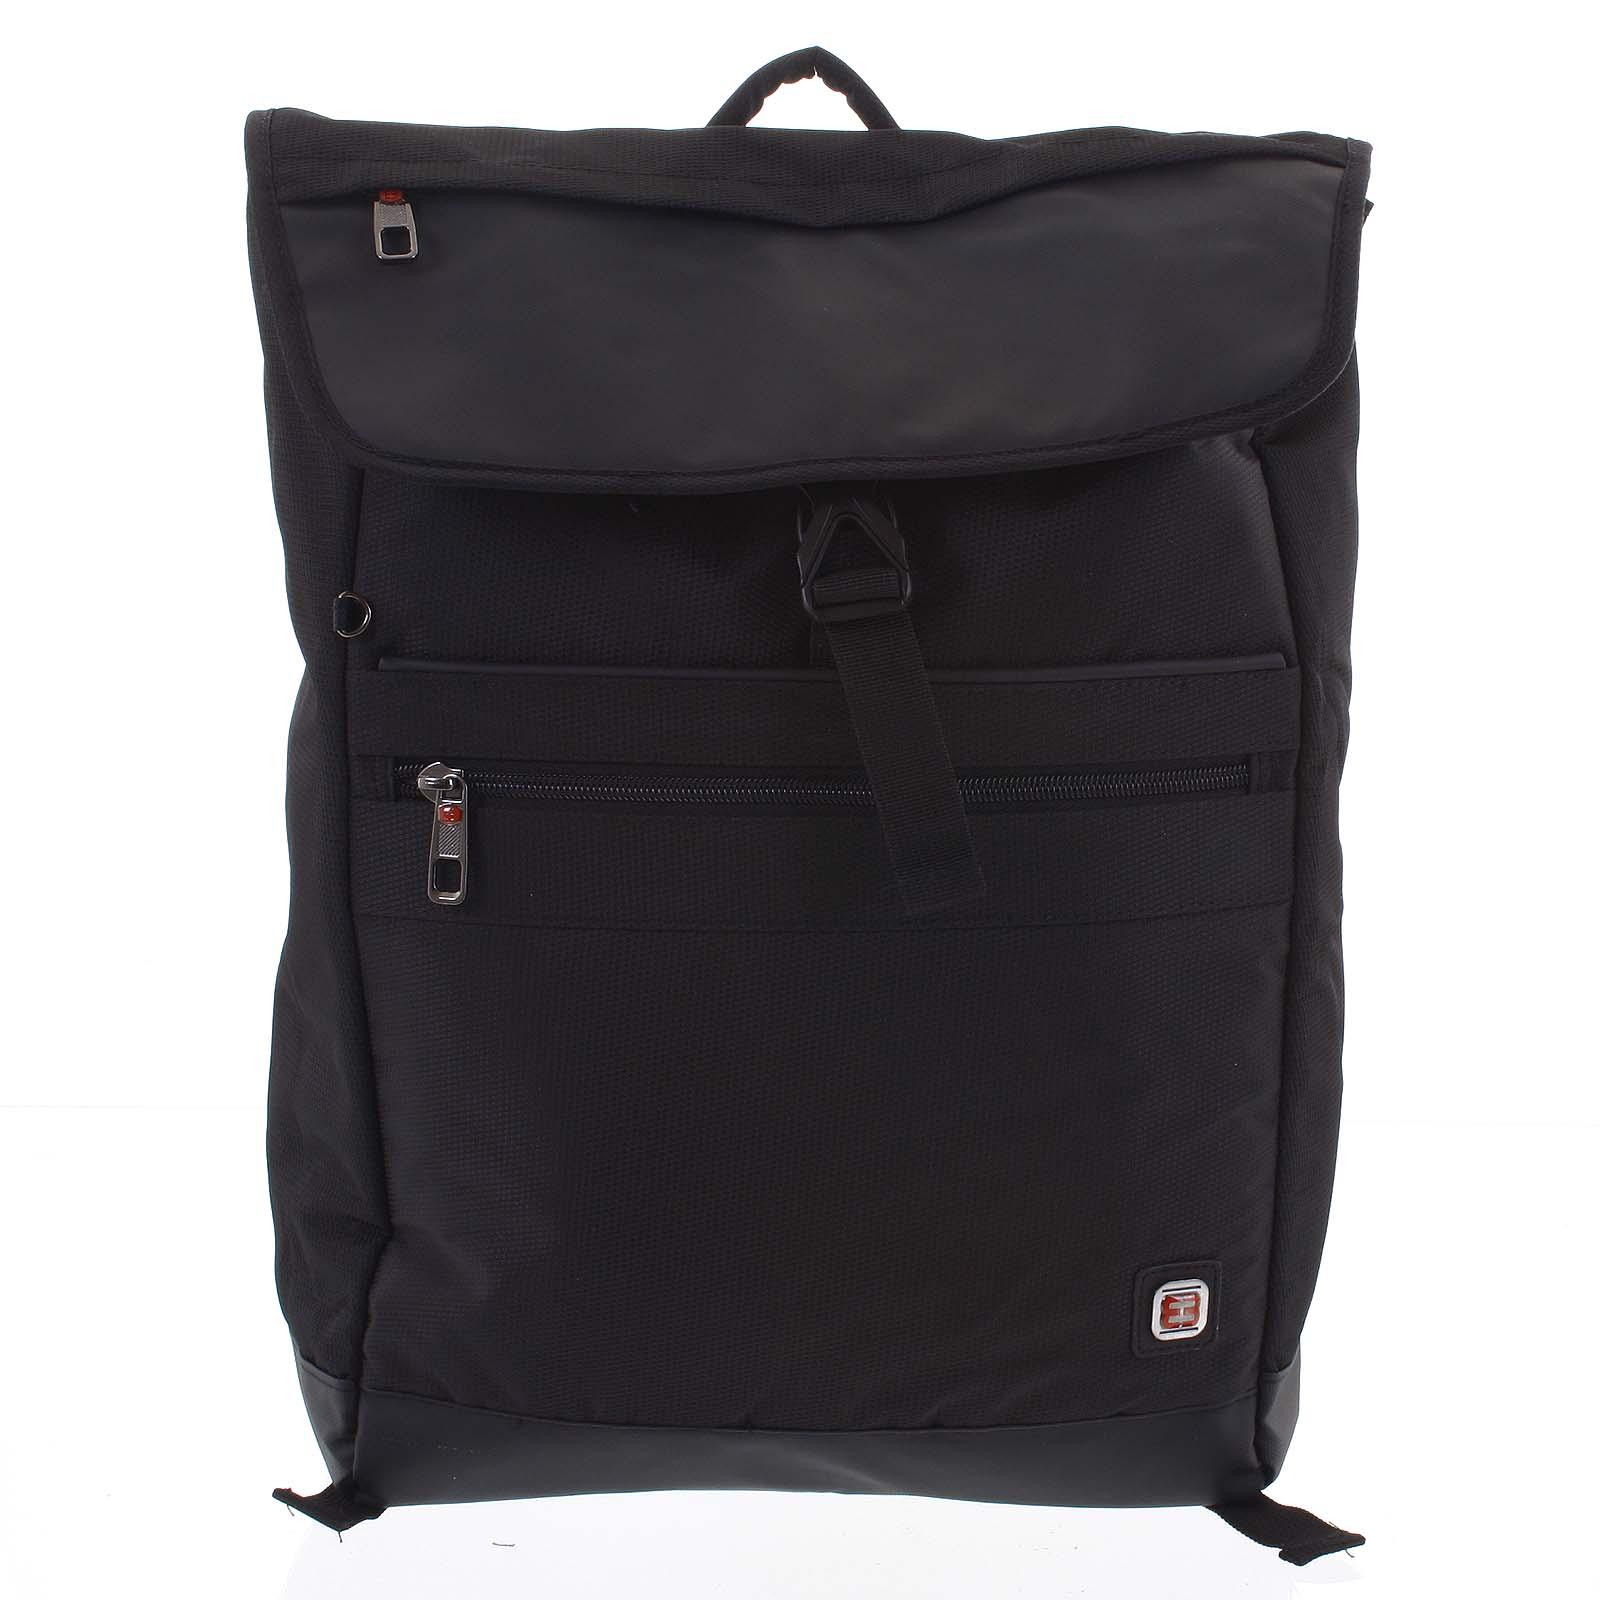 Velký černý batoh - Enrico Benetti Sanjar